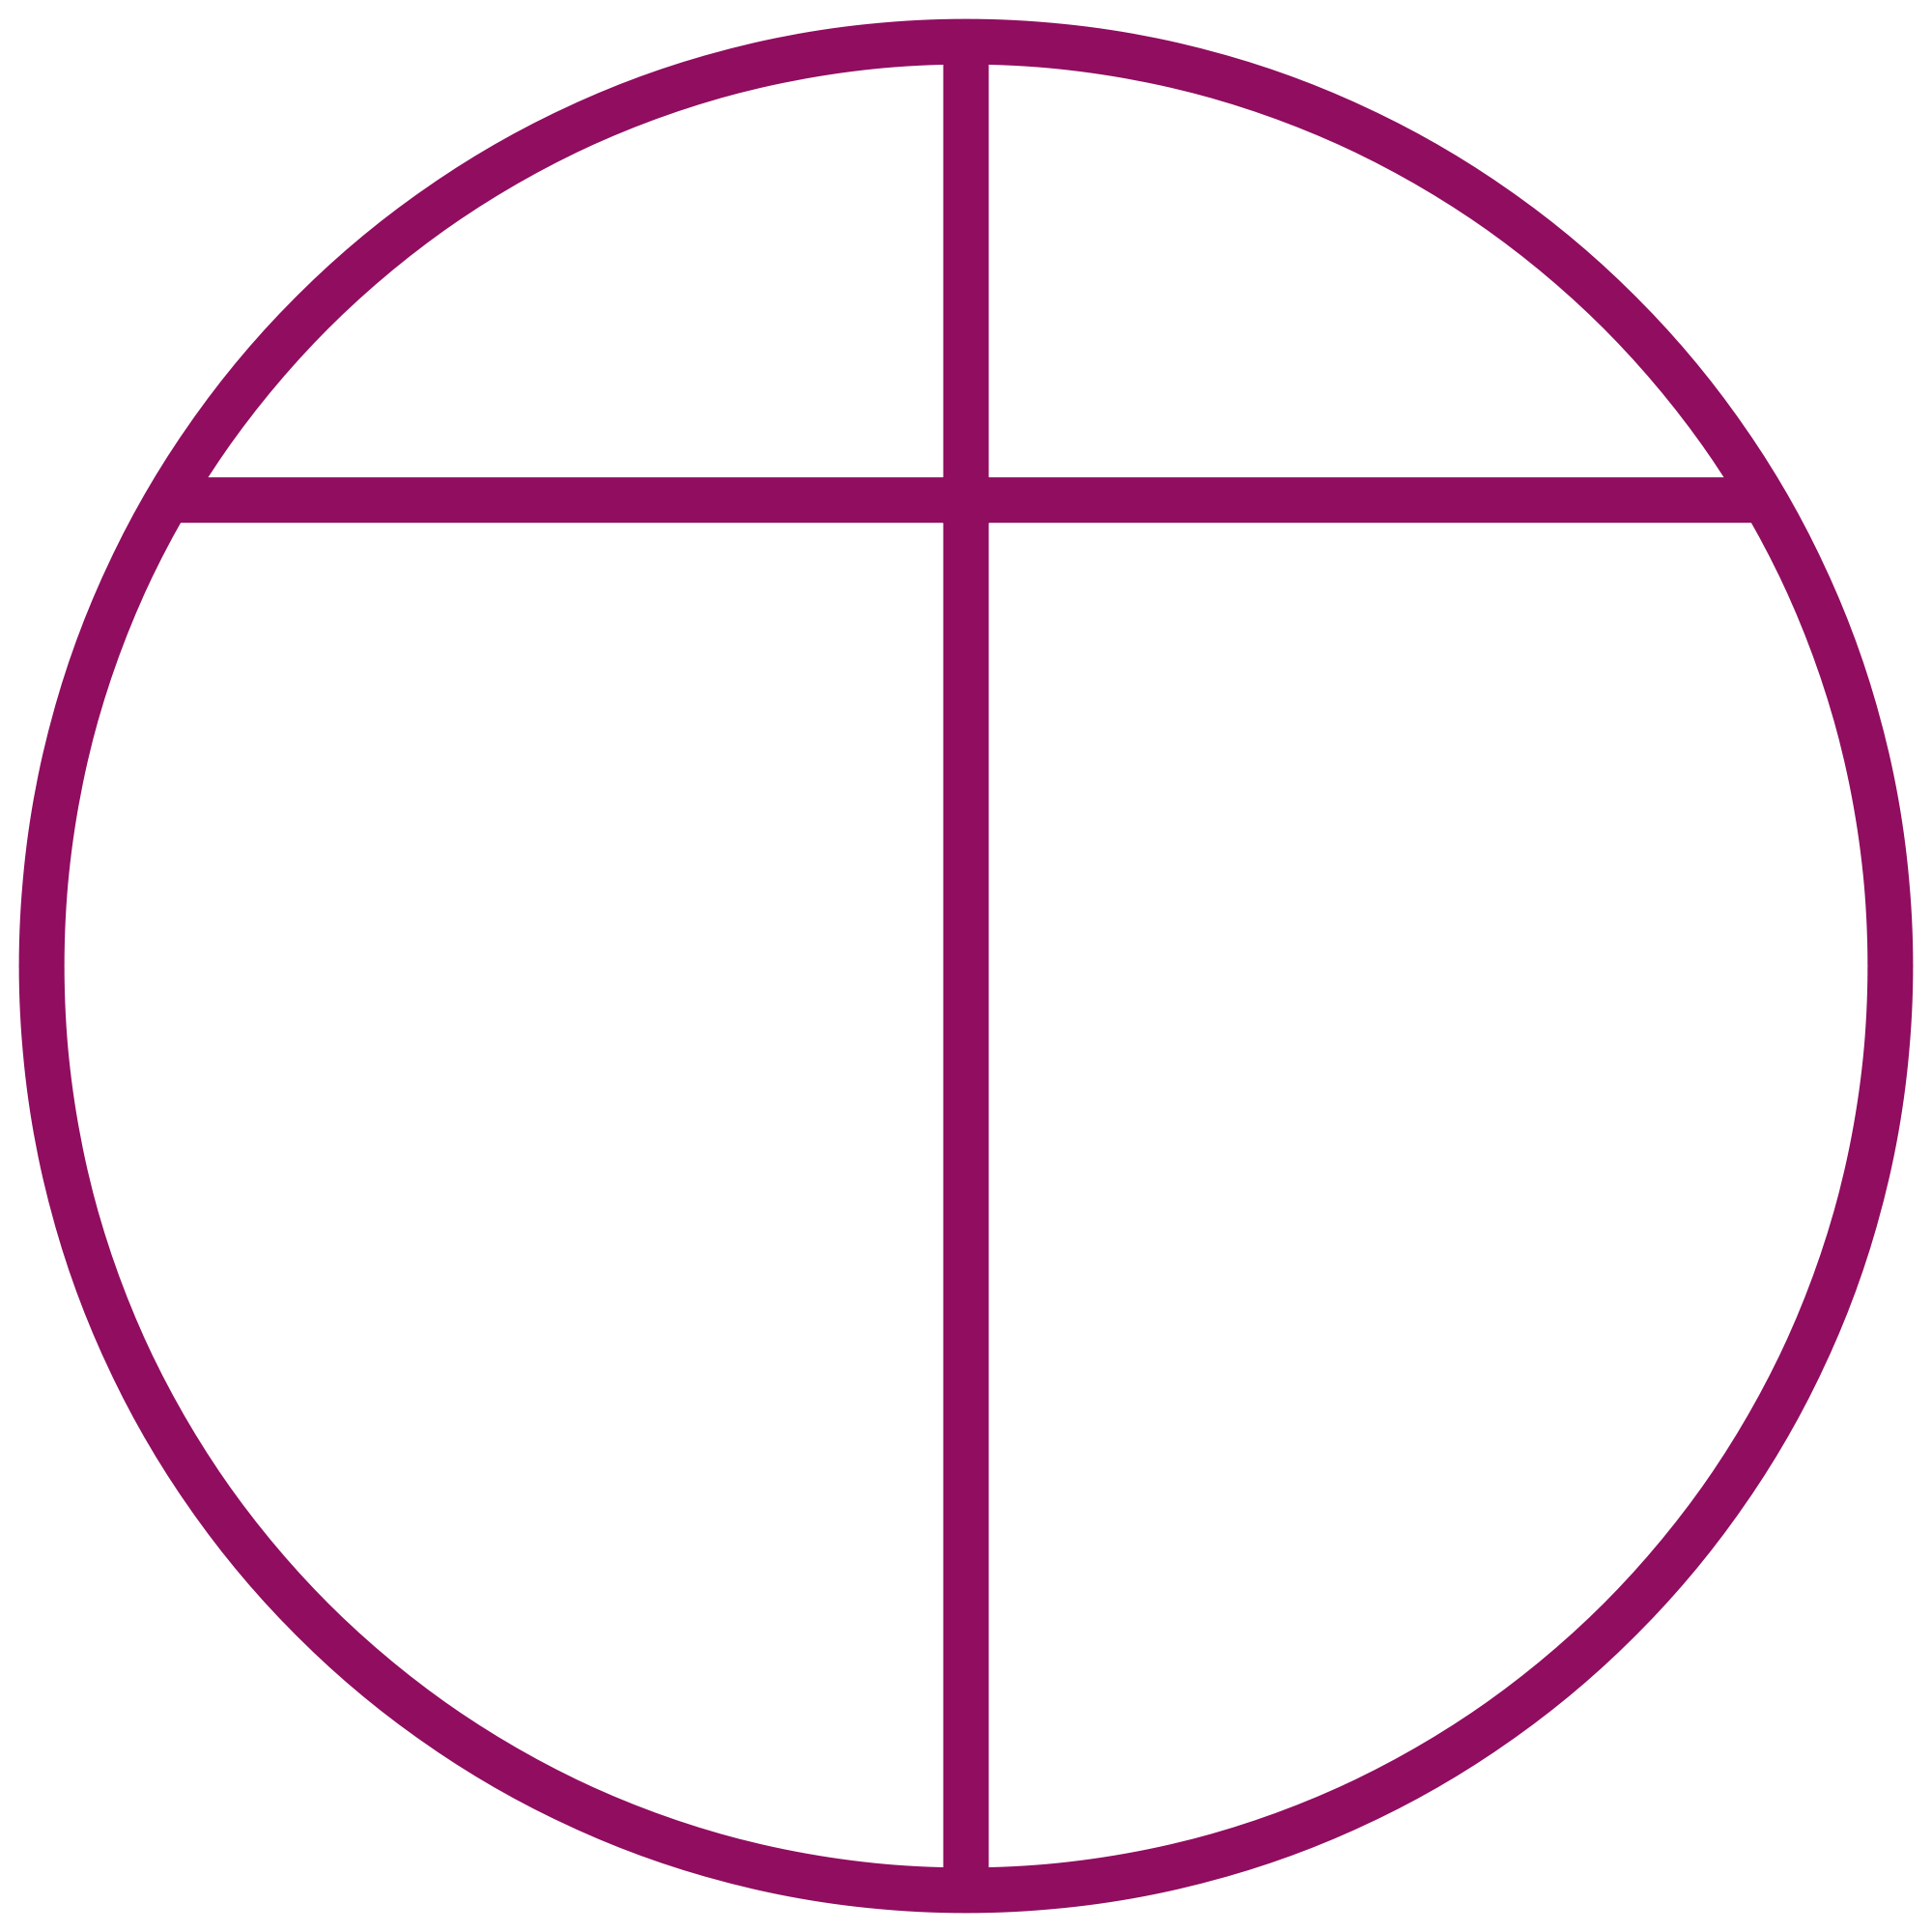 Opus dei symbol the da vinci code pinterest vatican opus dei symbol buycottarizona Choice Image